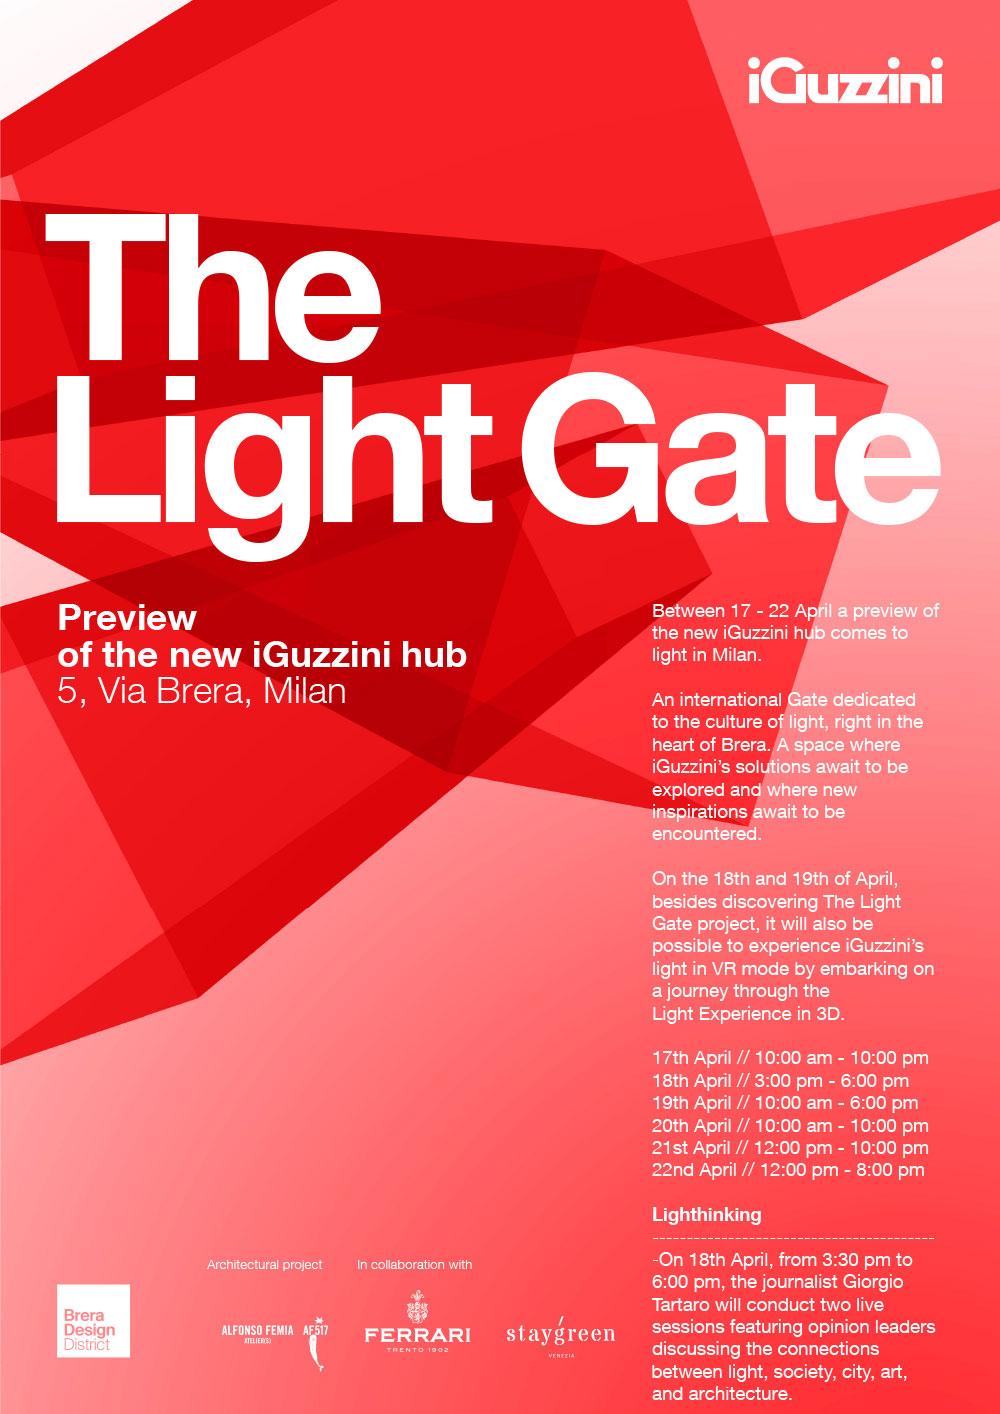 The Light Gate